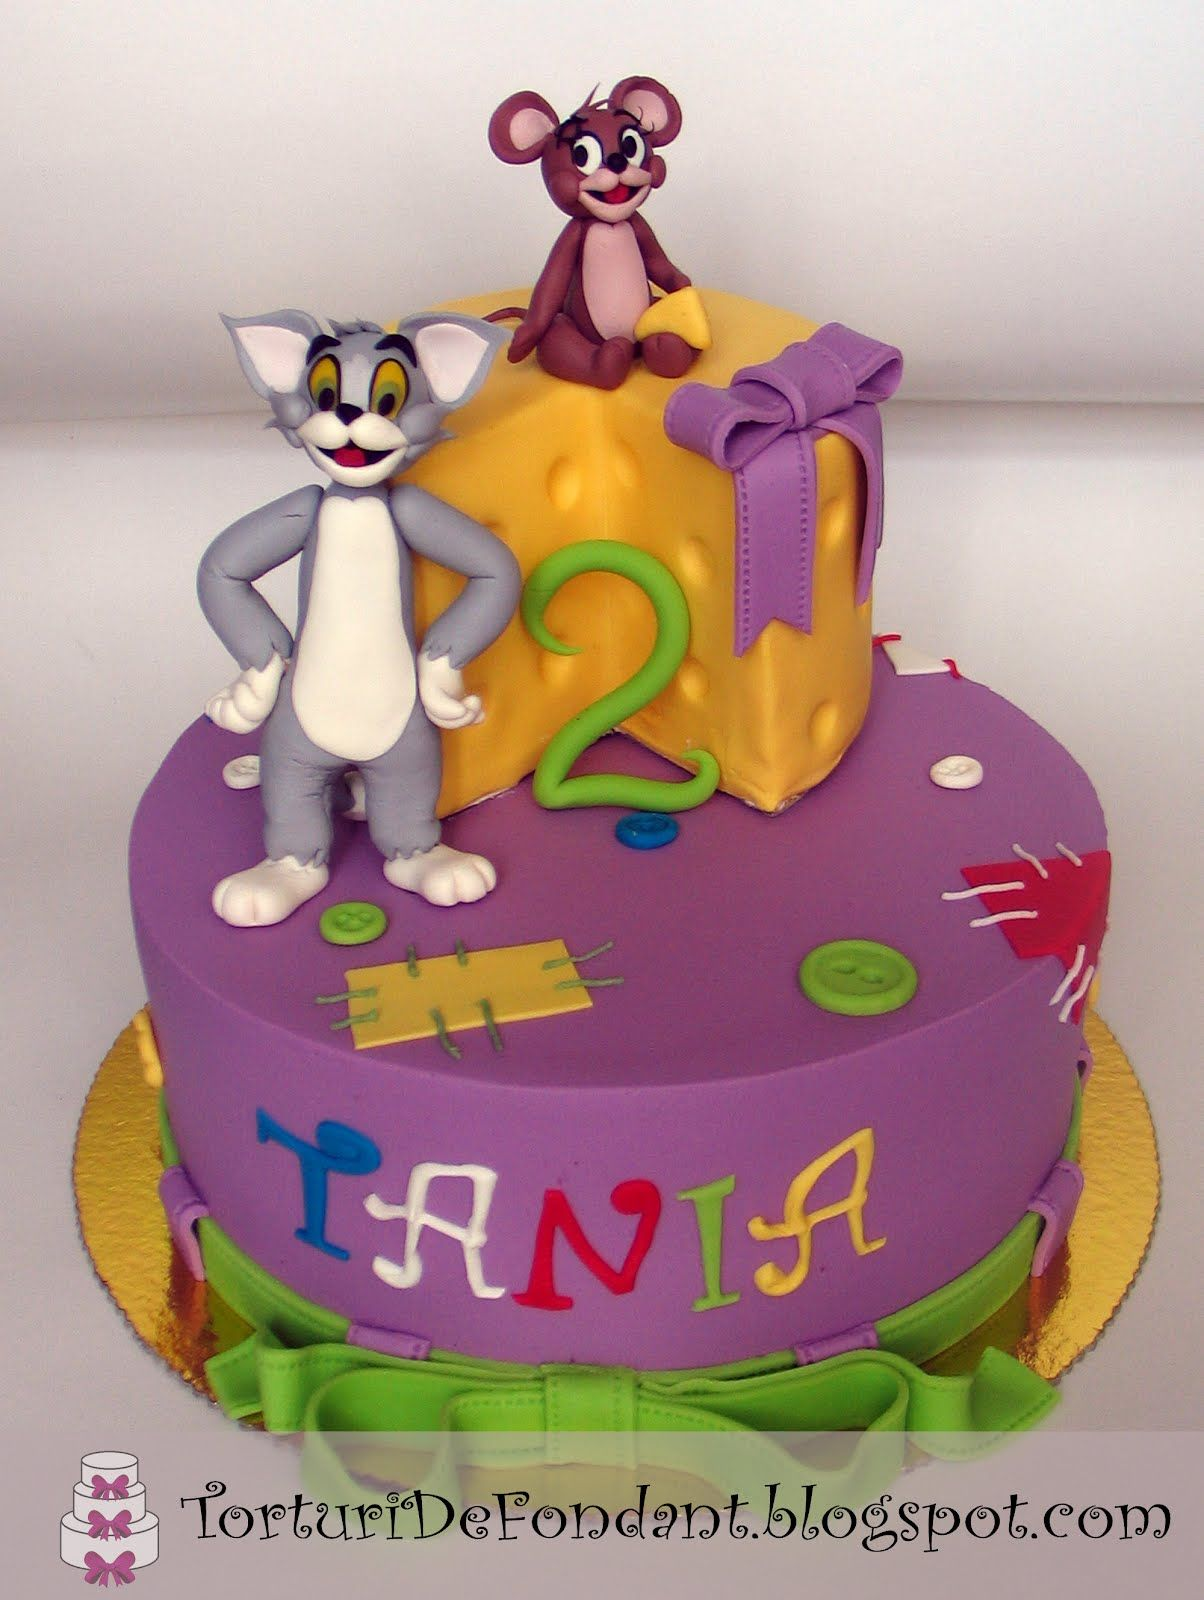 Tom Jerry Torturi de fondant Kids Birthday cakes 1